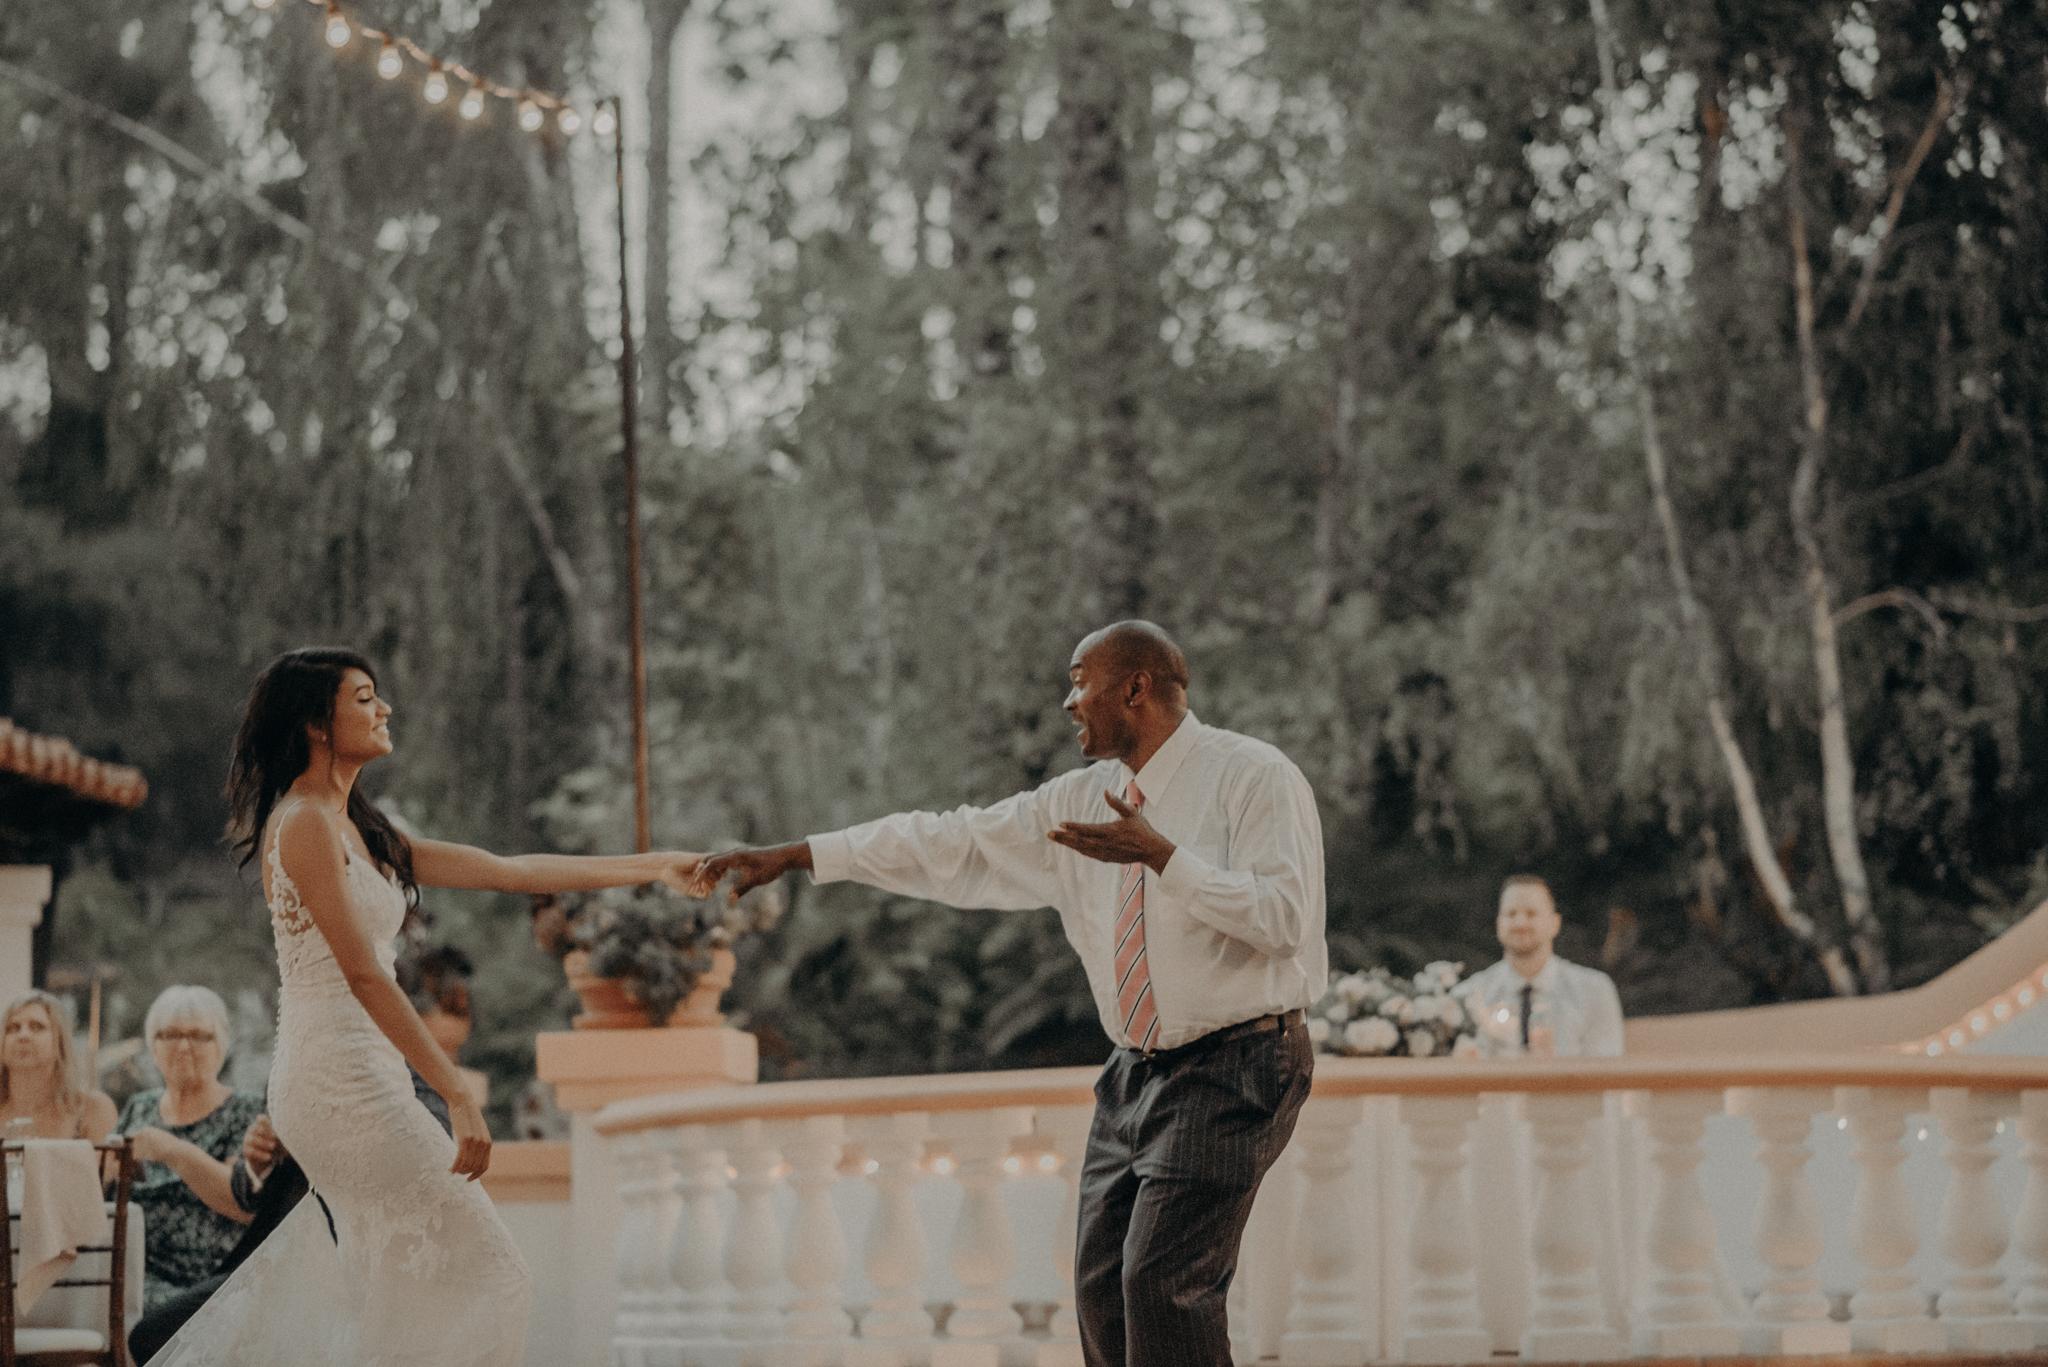 Isaiah + Taylor Photography - Rancho Las Lomas Wedding, Los Angeles Wedding Photographer-152.jpg